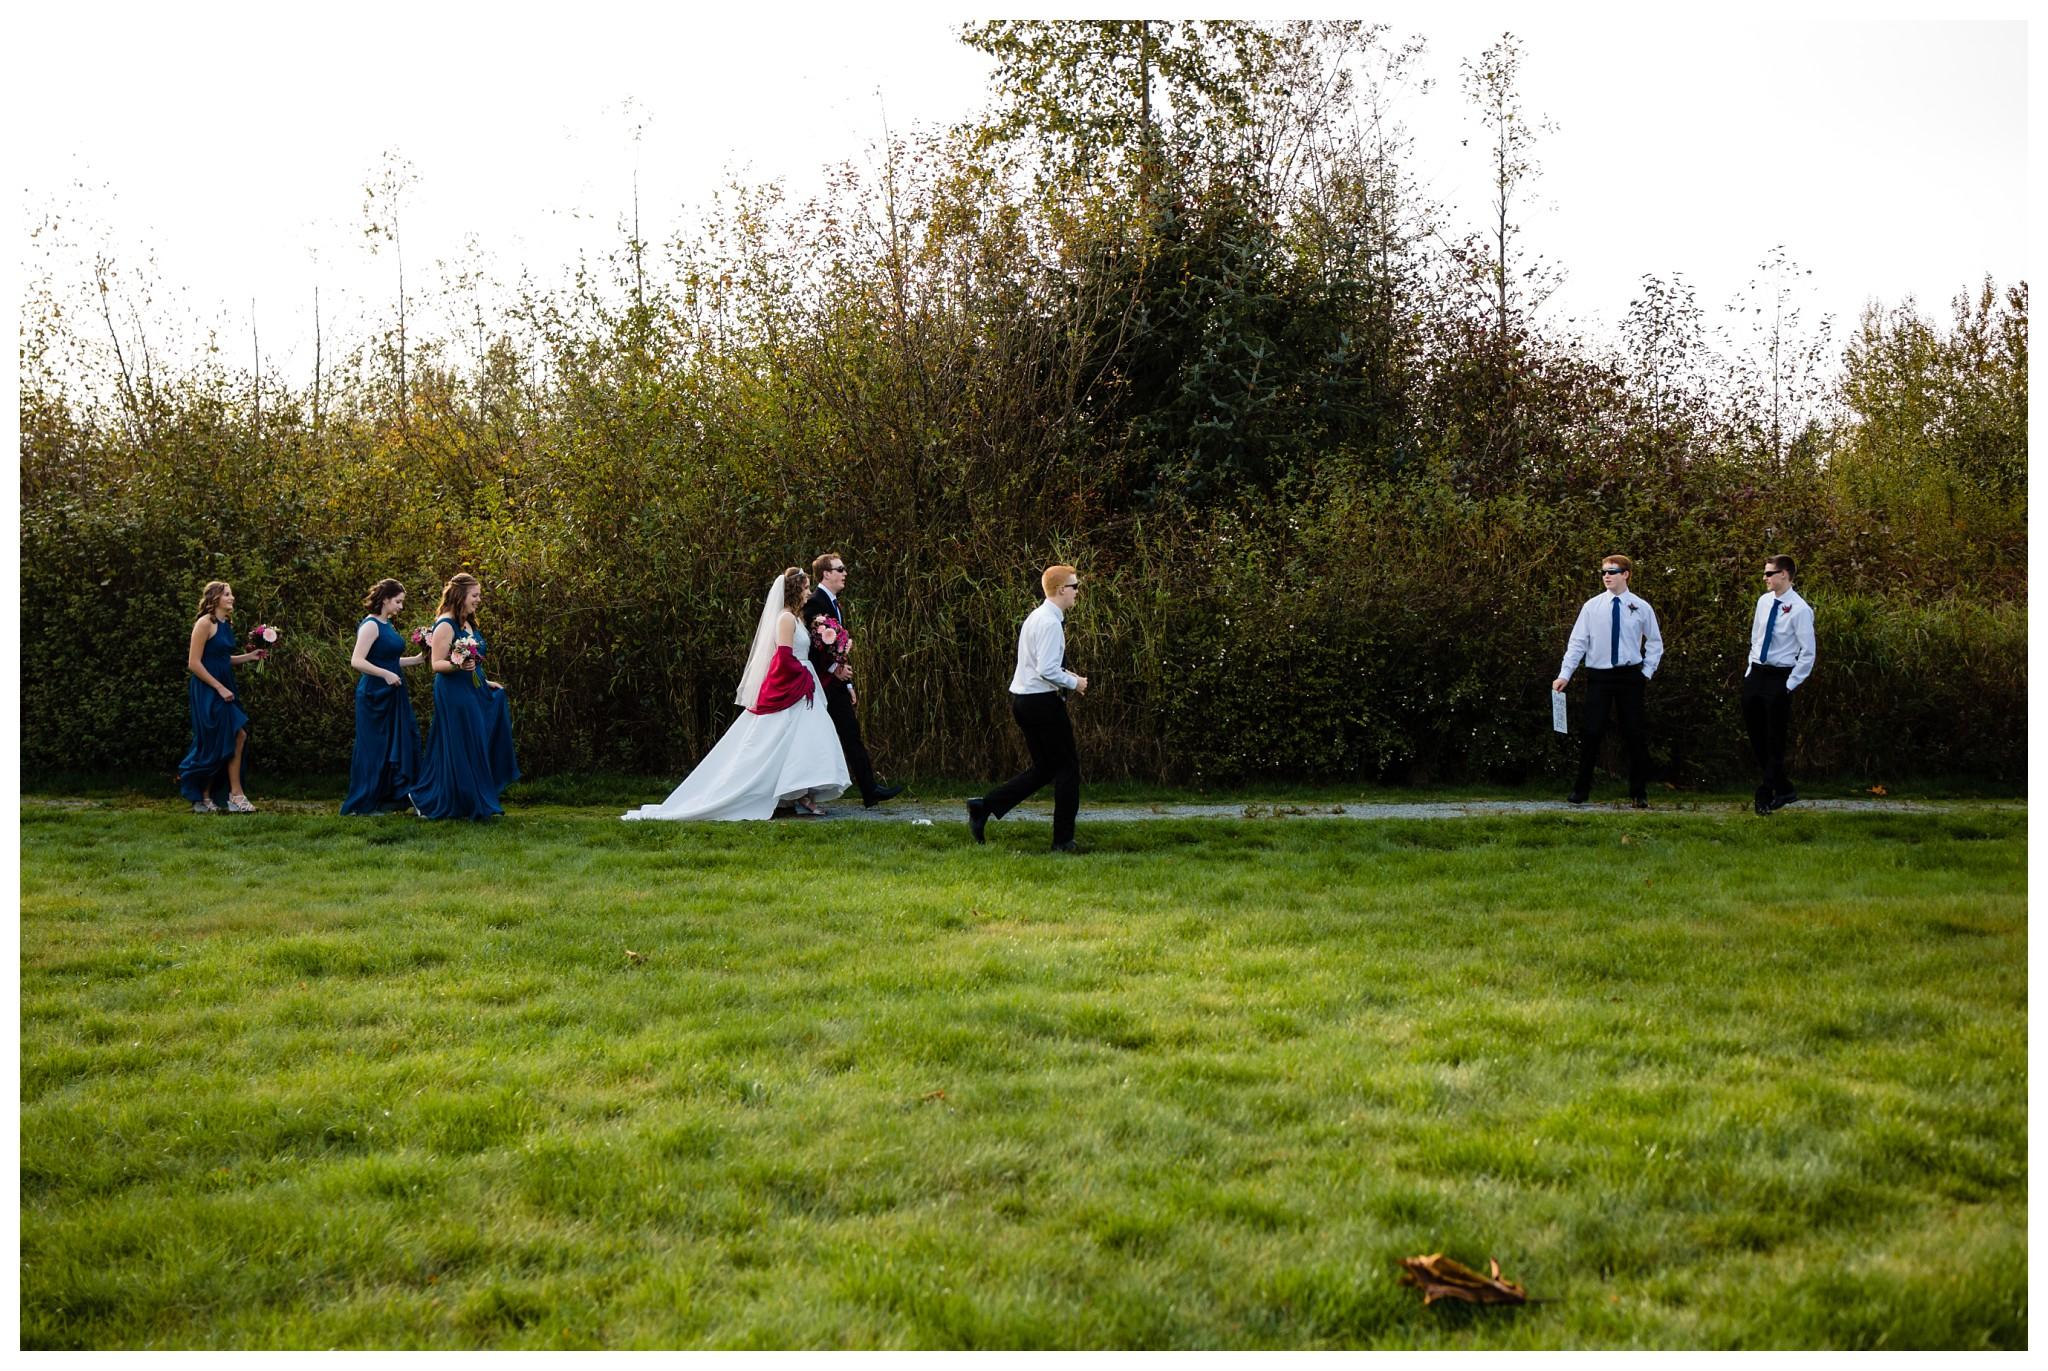 Aldergrove Park Christian Church Wedding Photography Pink Flowers Blue Bridesmaid Dress Fall_0126.jpg